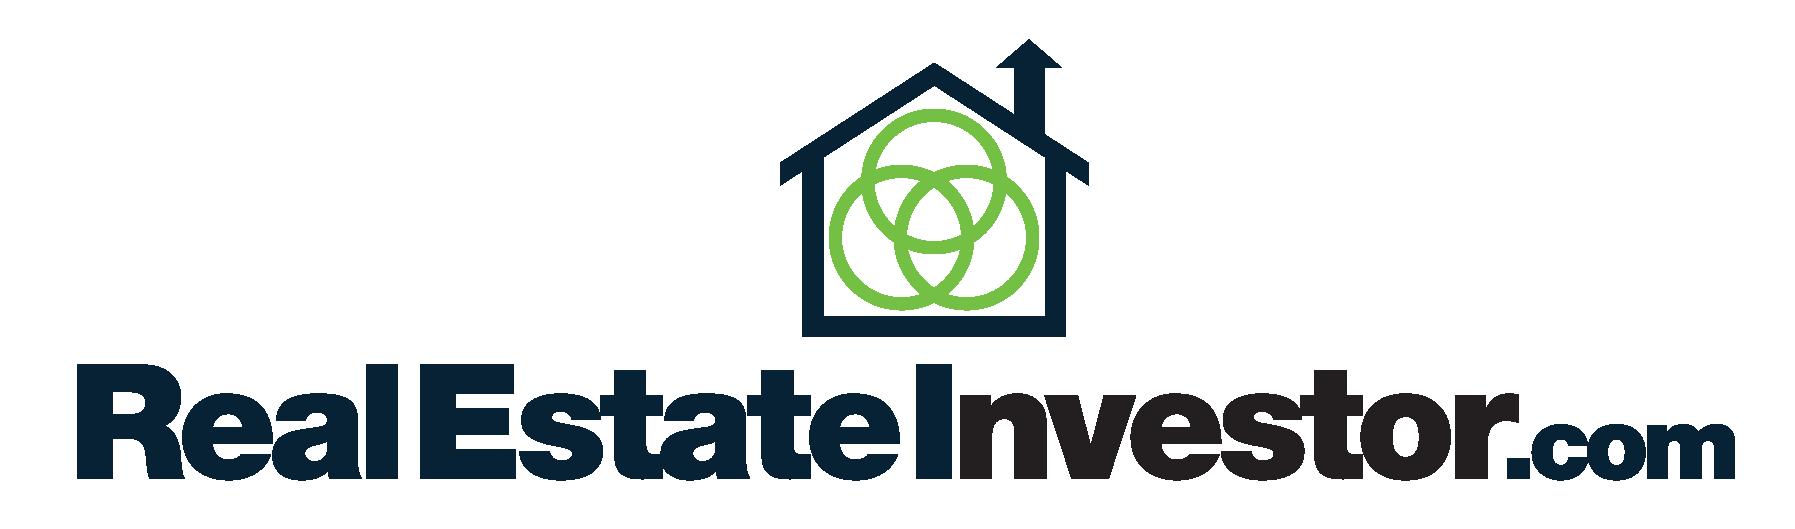 Real-Estate-Investor Logo